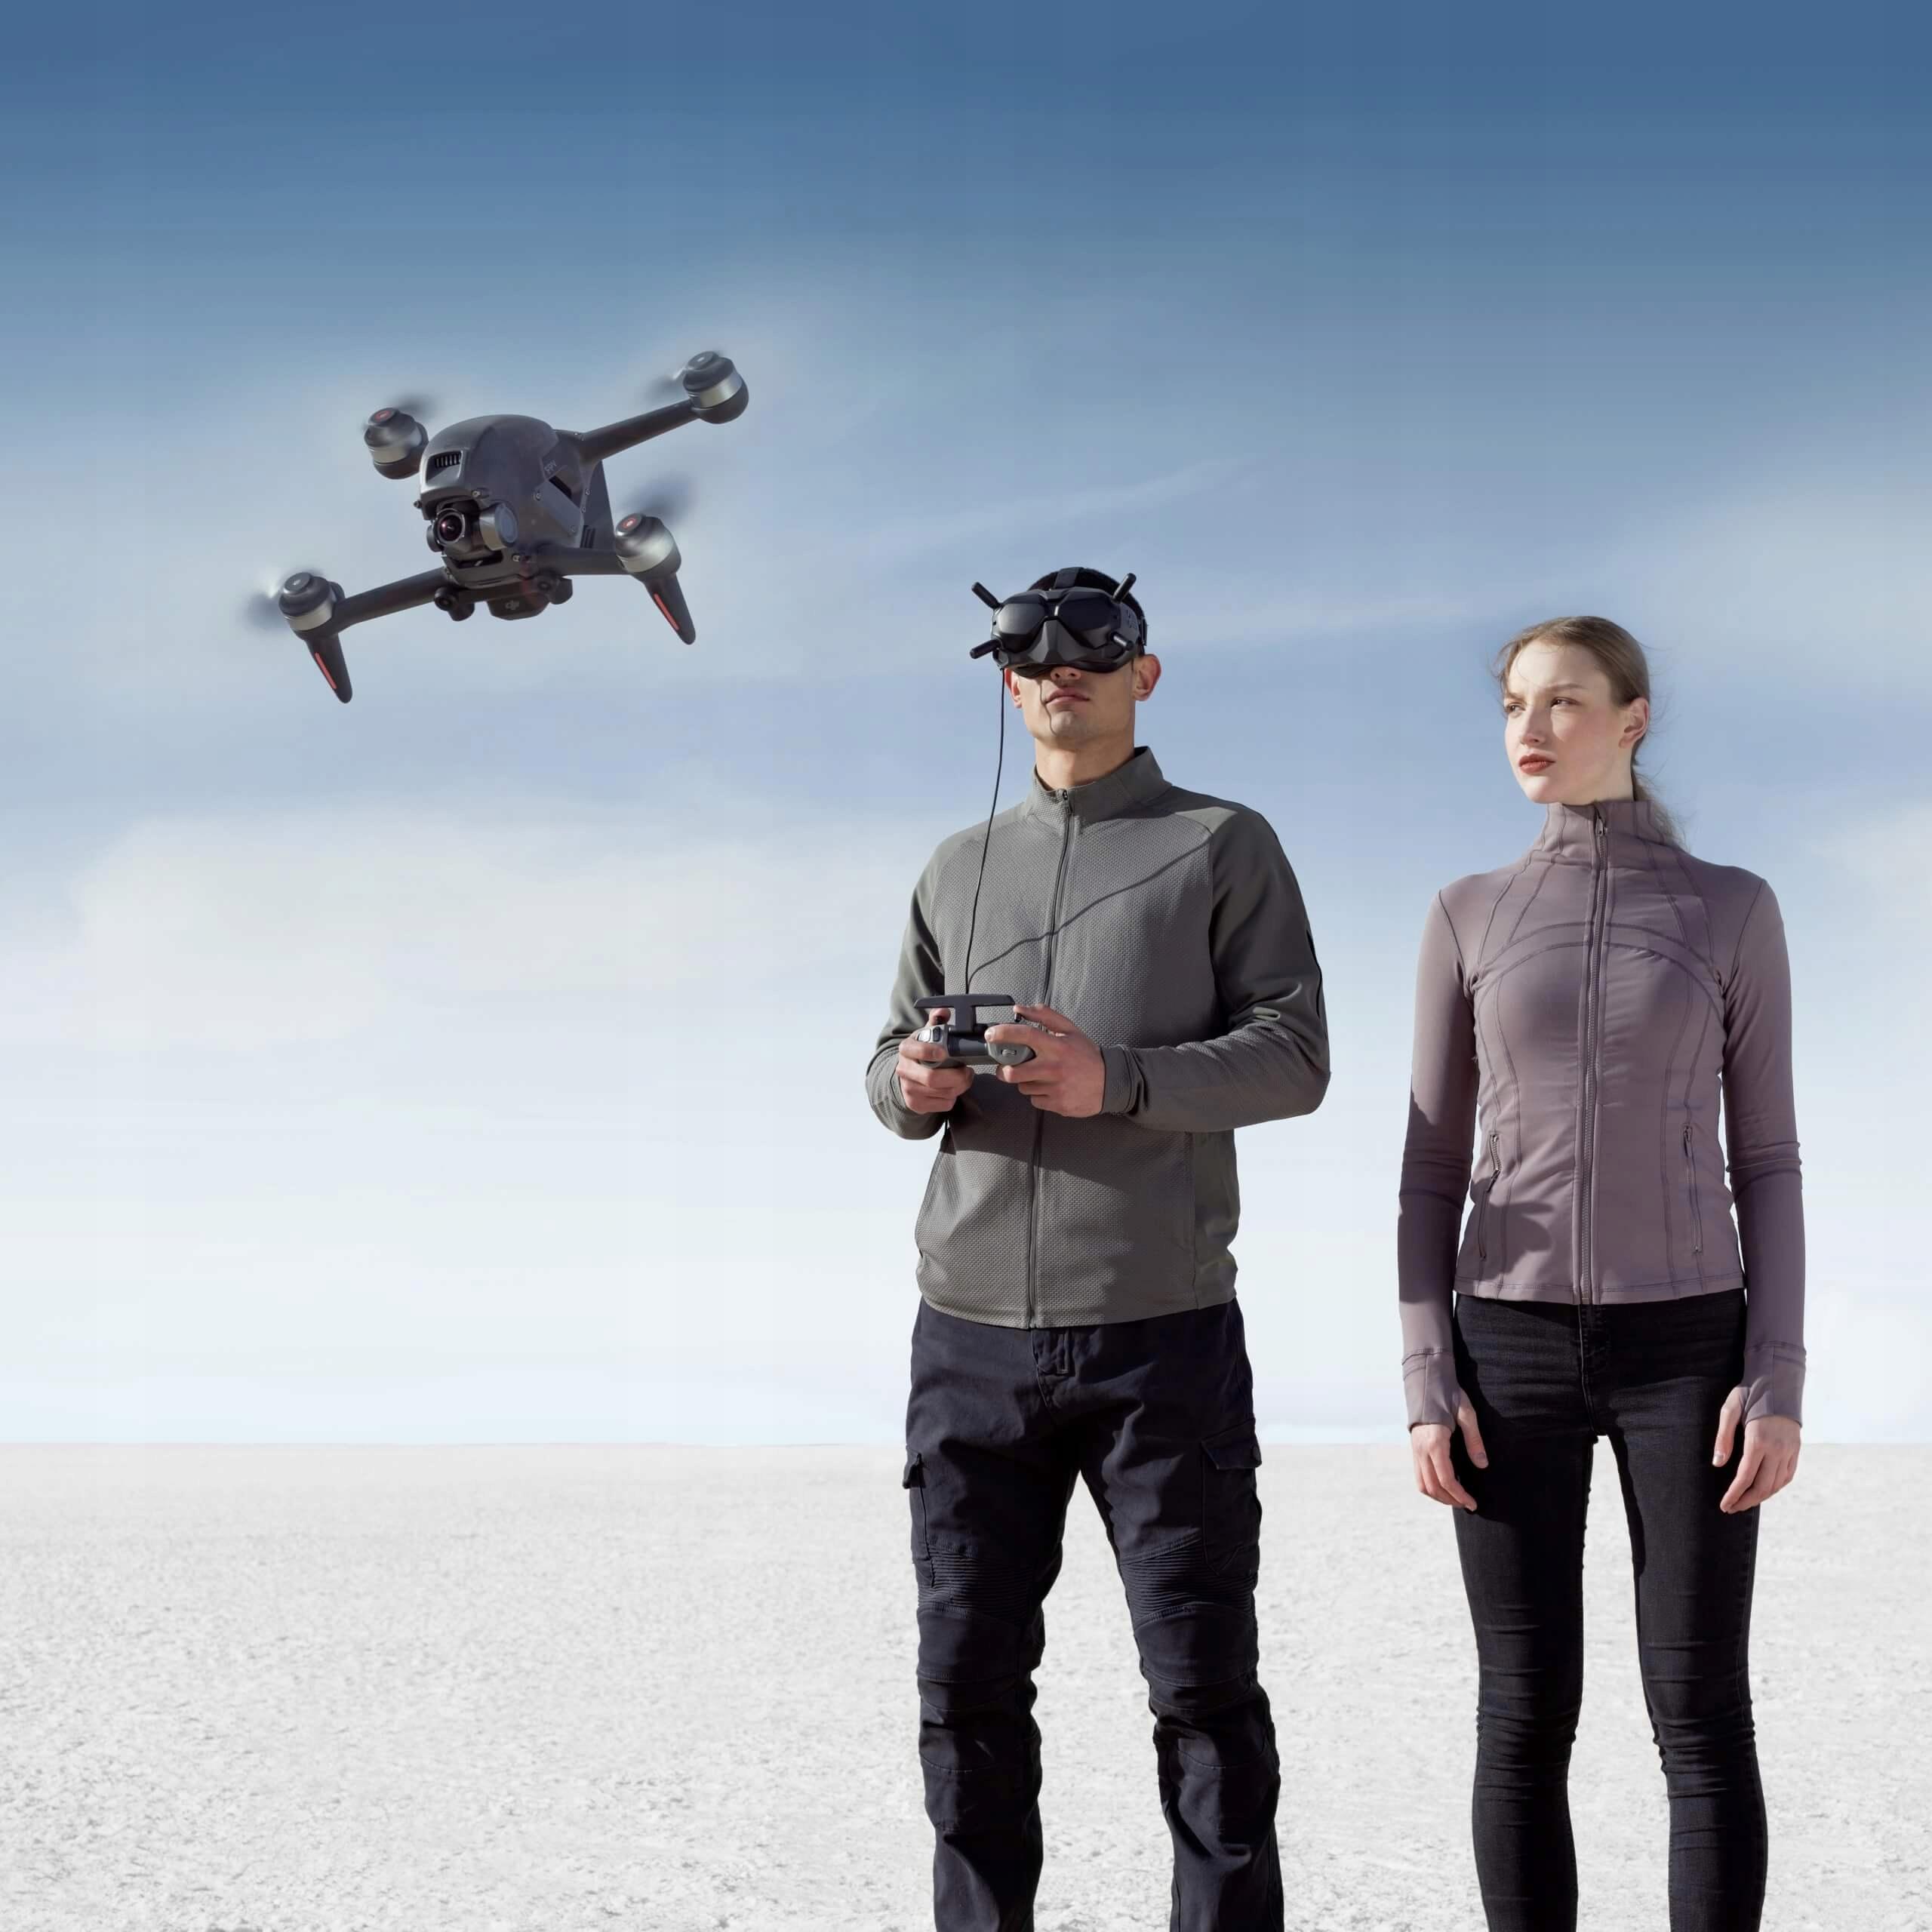 Dron DJI FPV + Fly More Kit (Combo) 3 Baterie Hub Liczba śmigieł 4